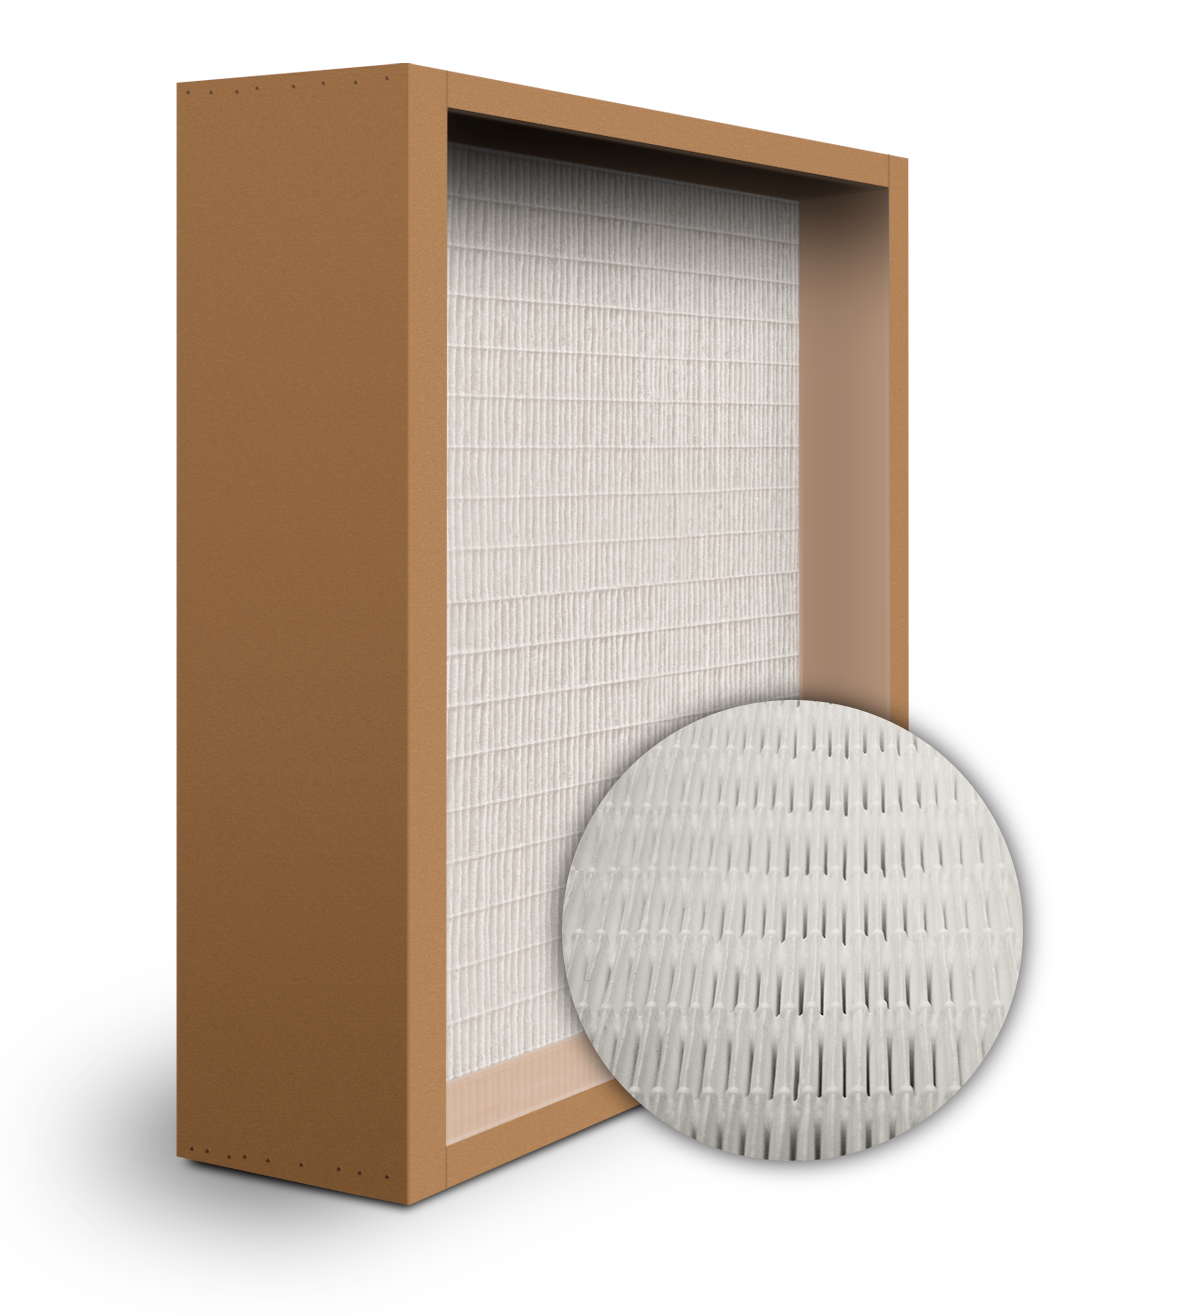 SuperFlo Max ASHRAE 85% (MERV 13) Particle Board Frame Mini Pleat Filter 24x24x6